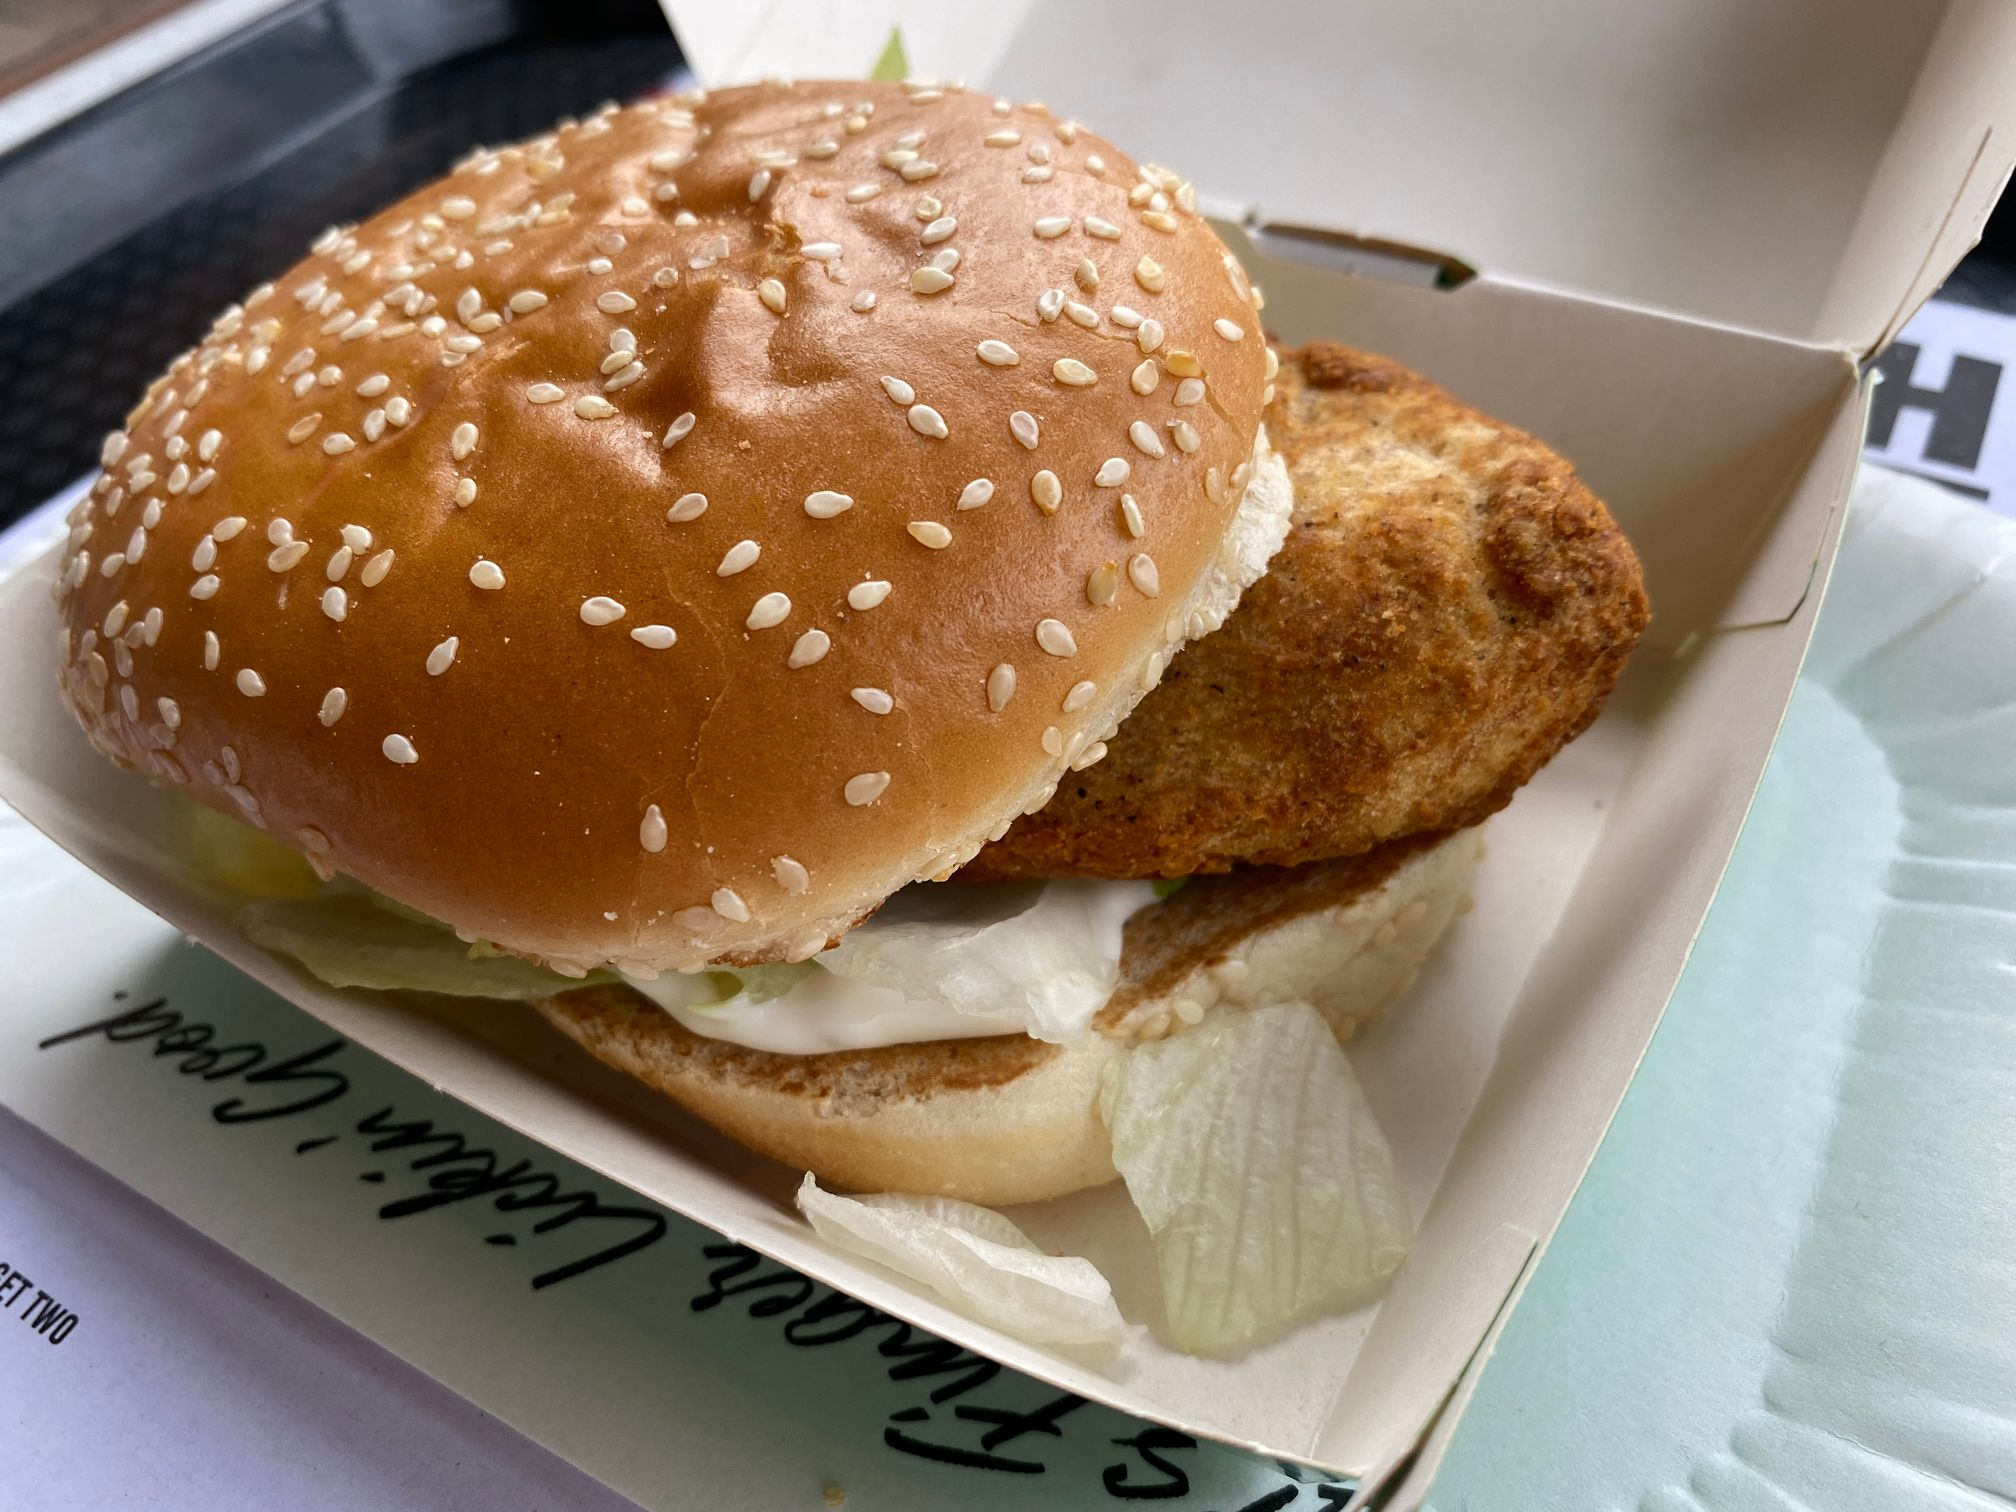 KFC Quorn Burger